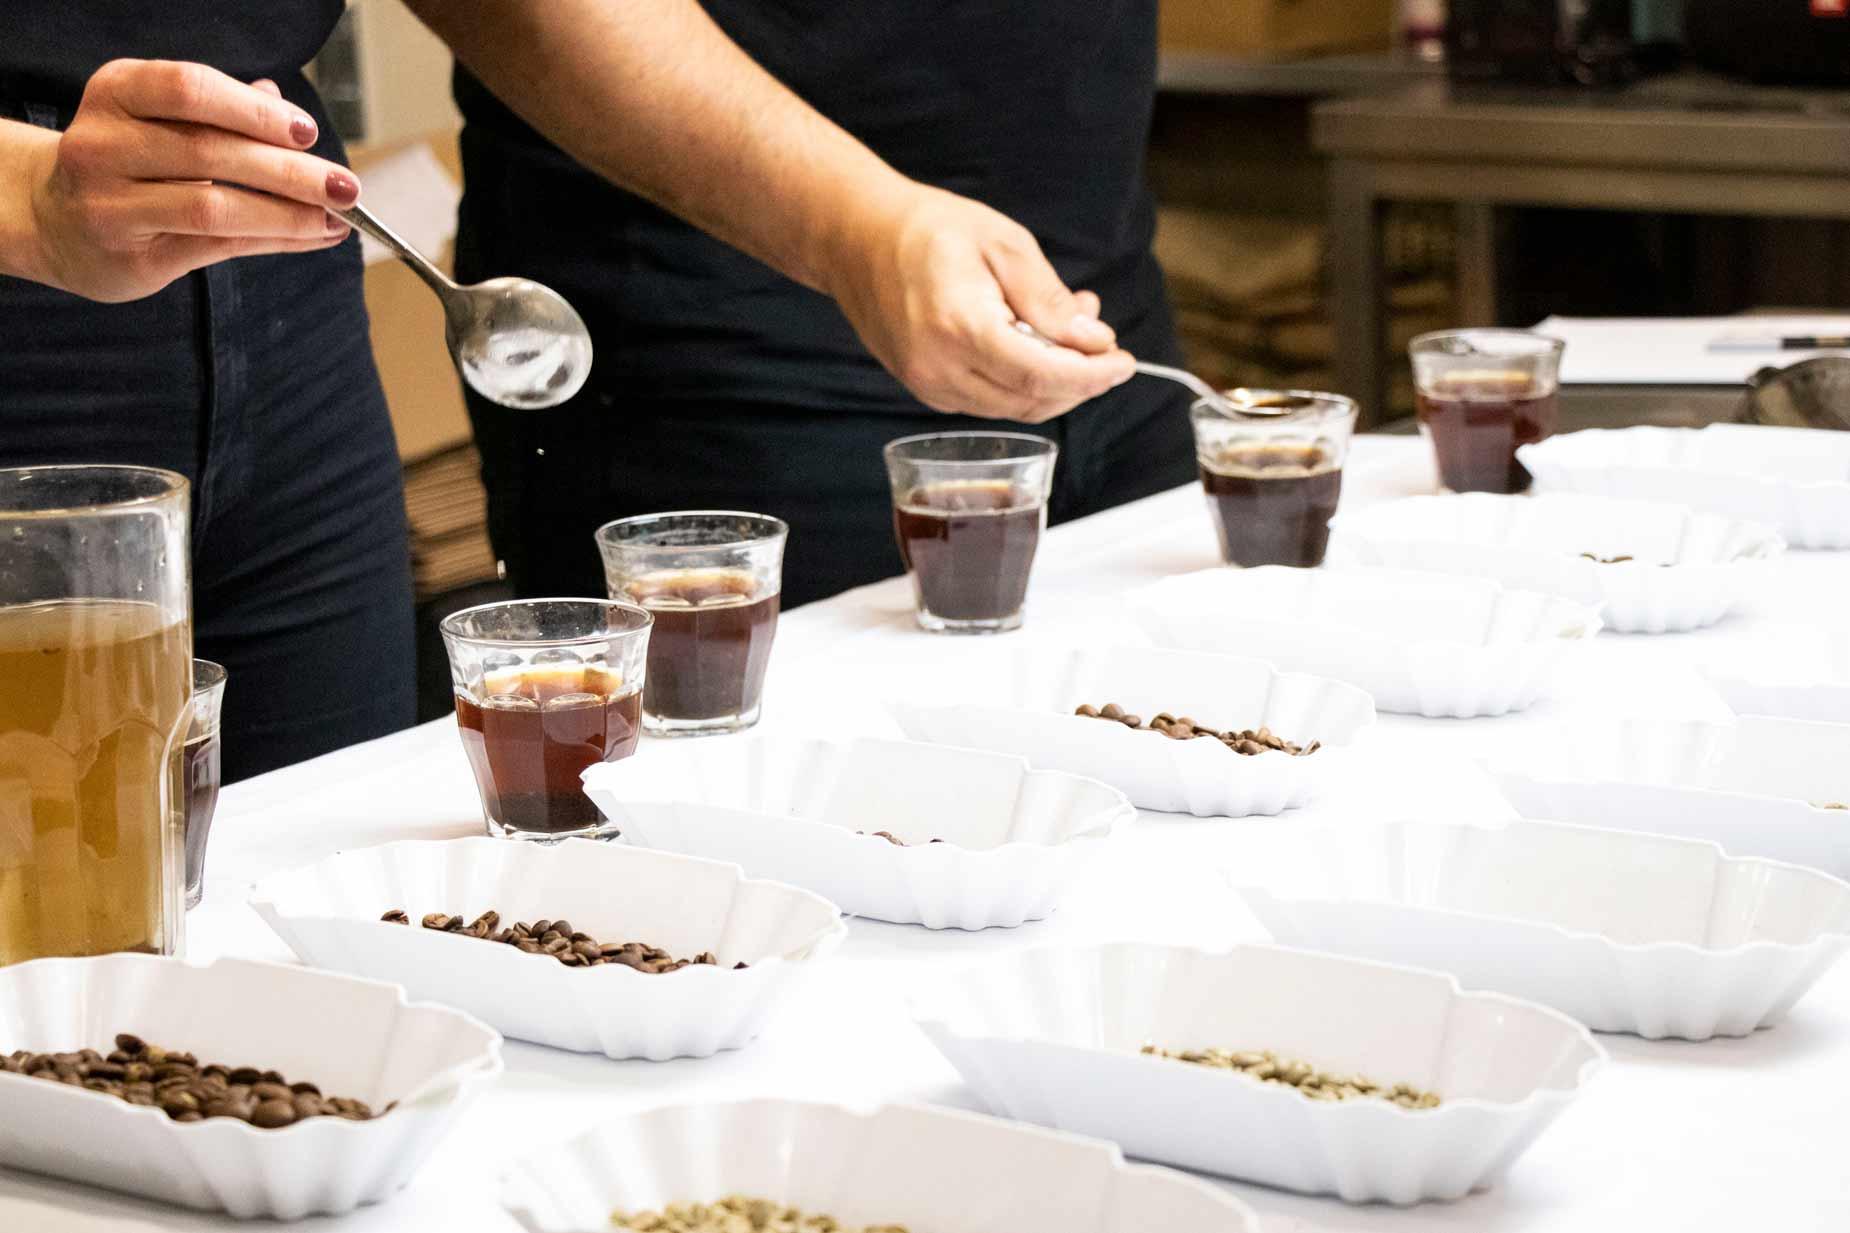 Coffee Tasting in der Rösterei